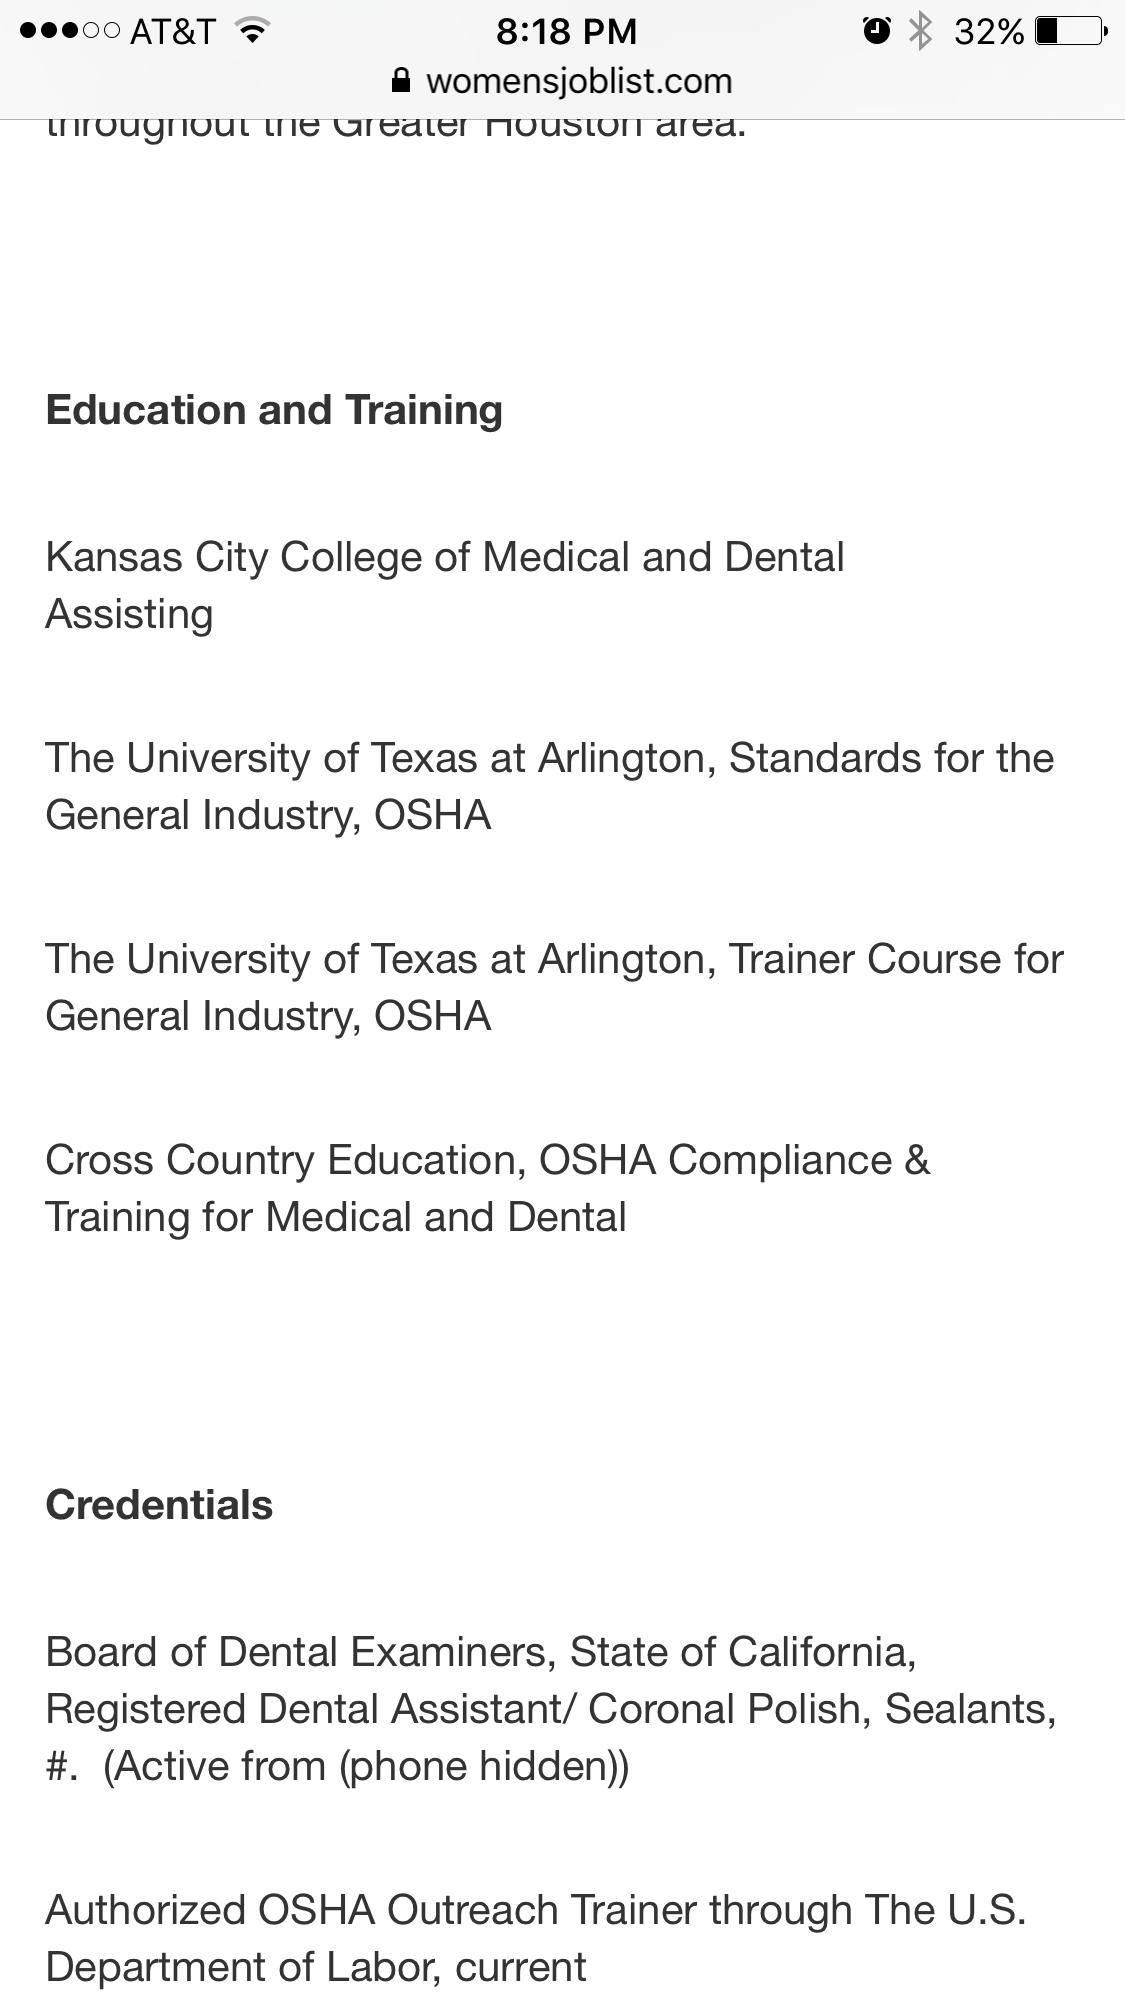 Pin by Kim Alford on OSHA/HIPAA Compliance Kansas city